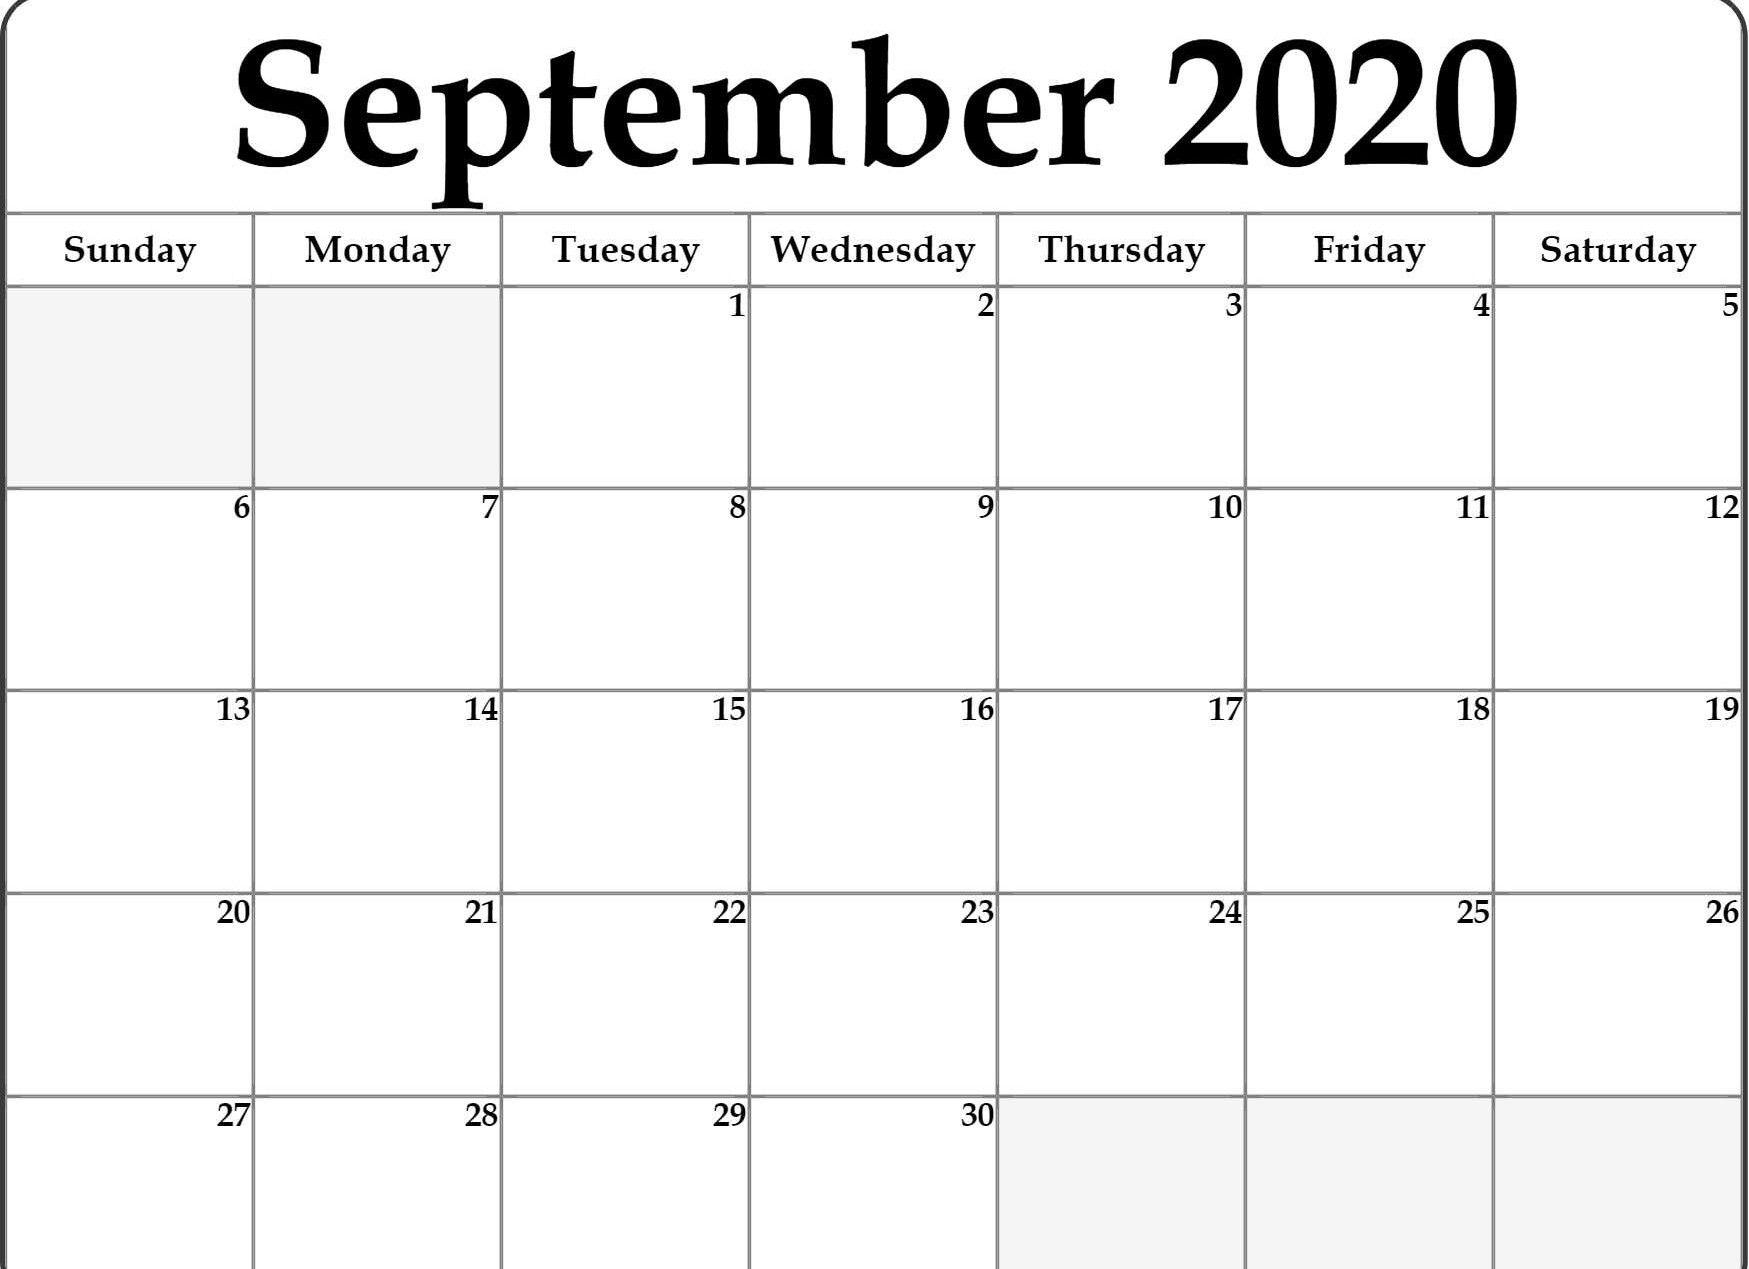 Blank September 2020 Calendar Printable Free Download In 2020